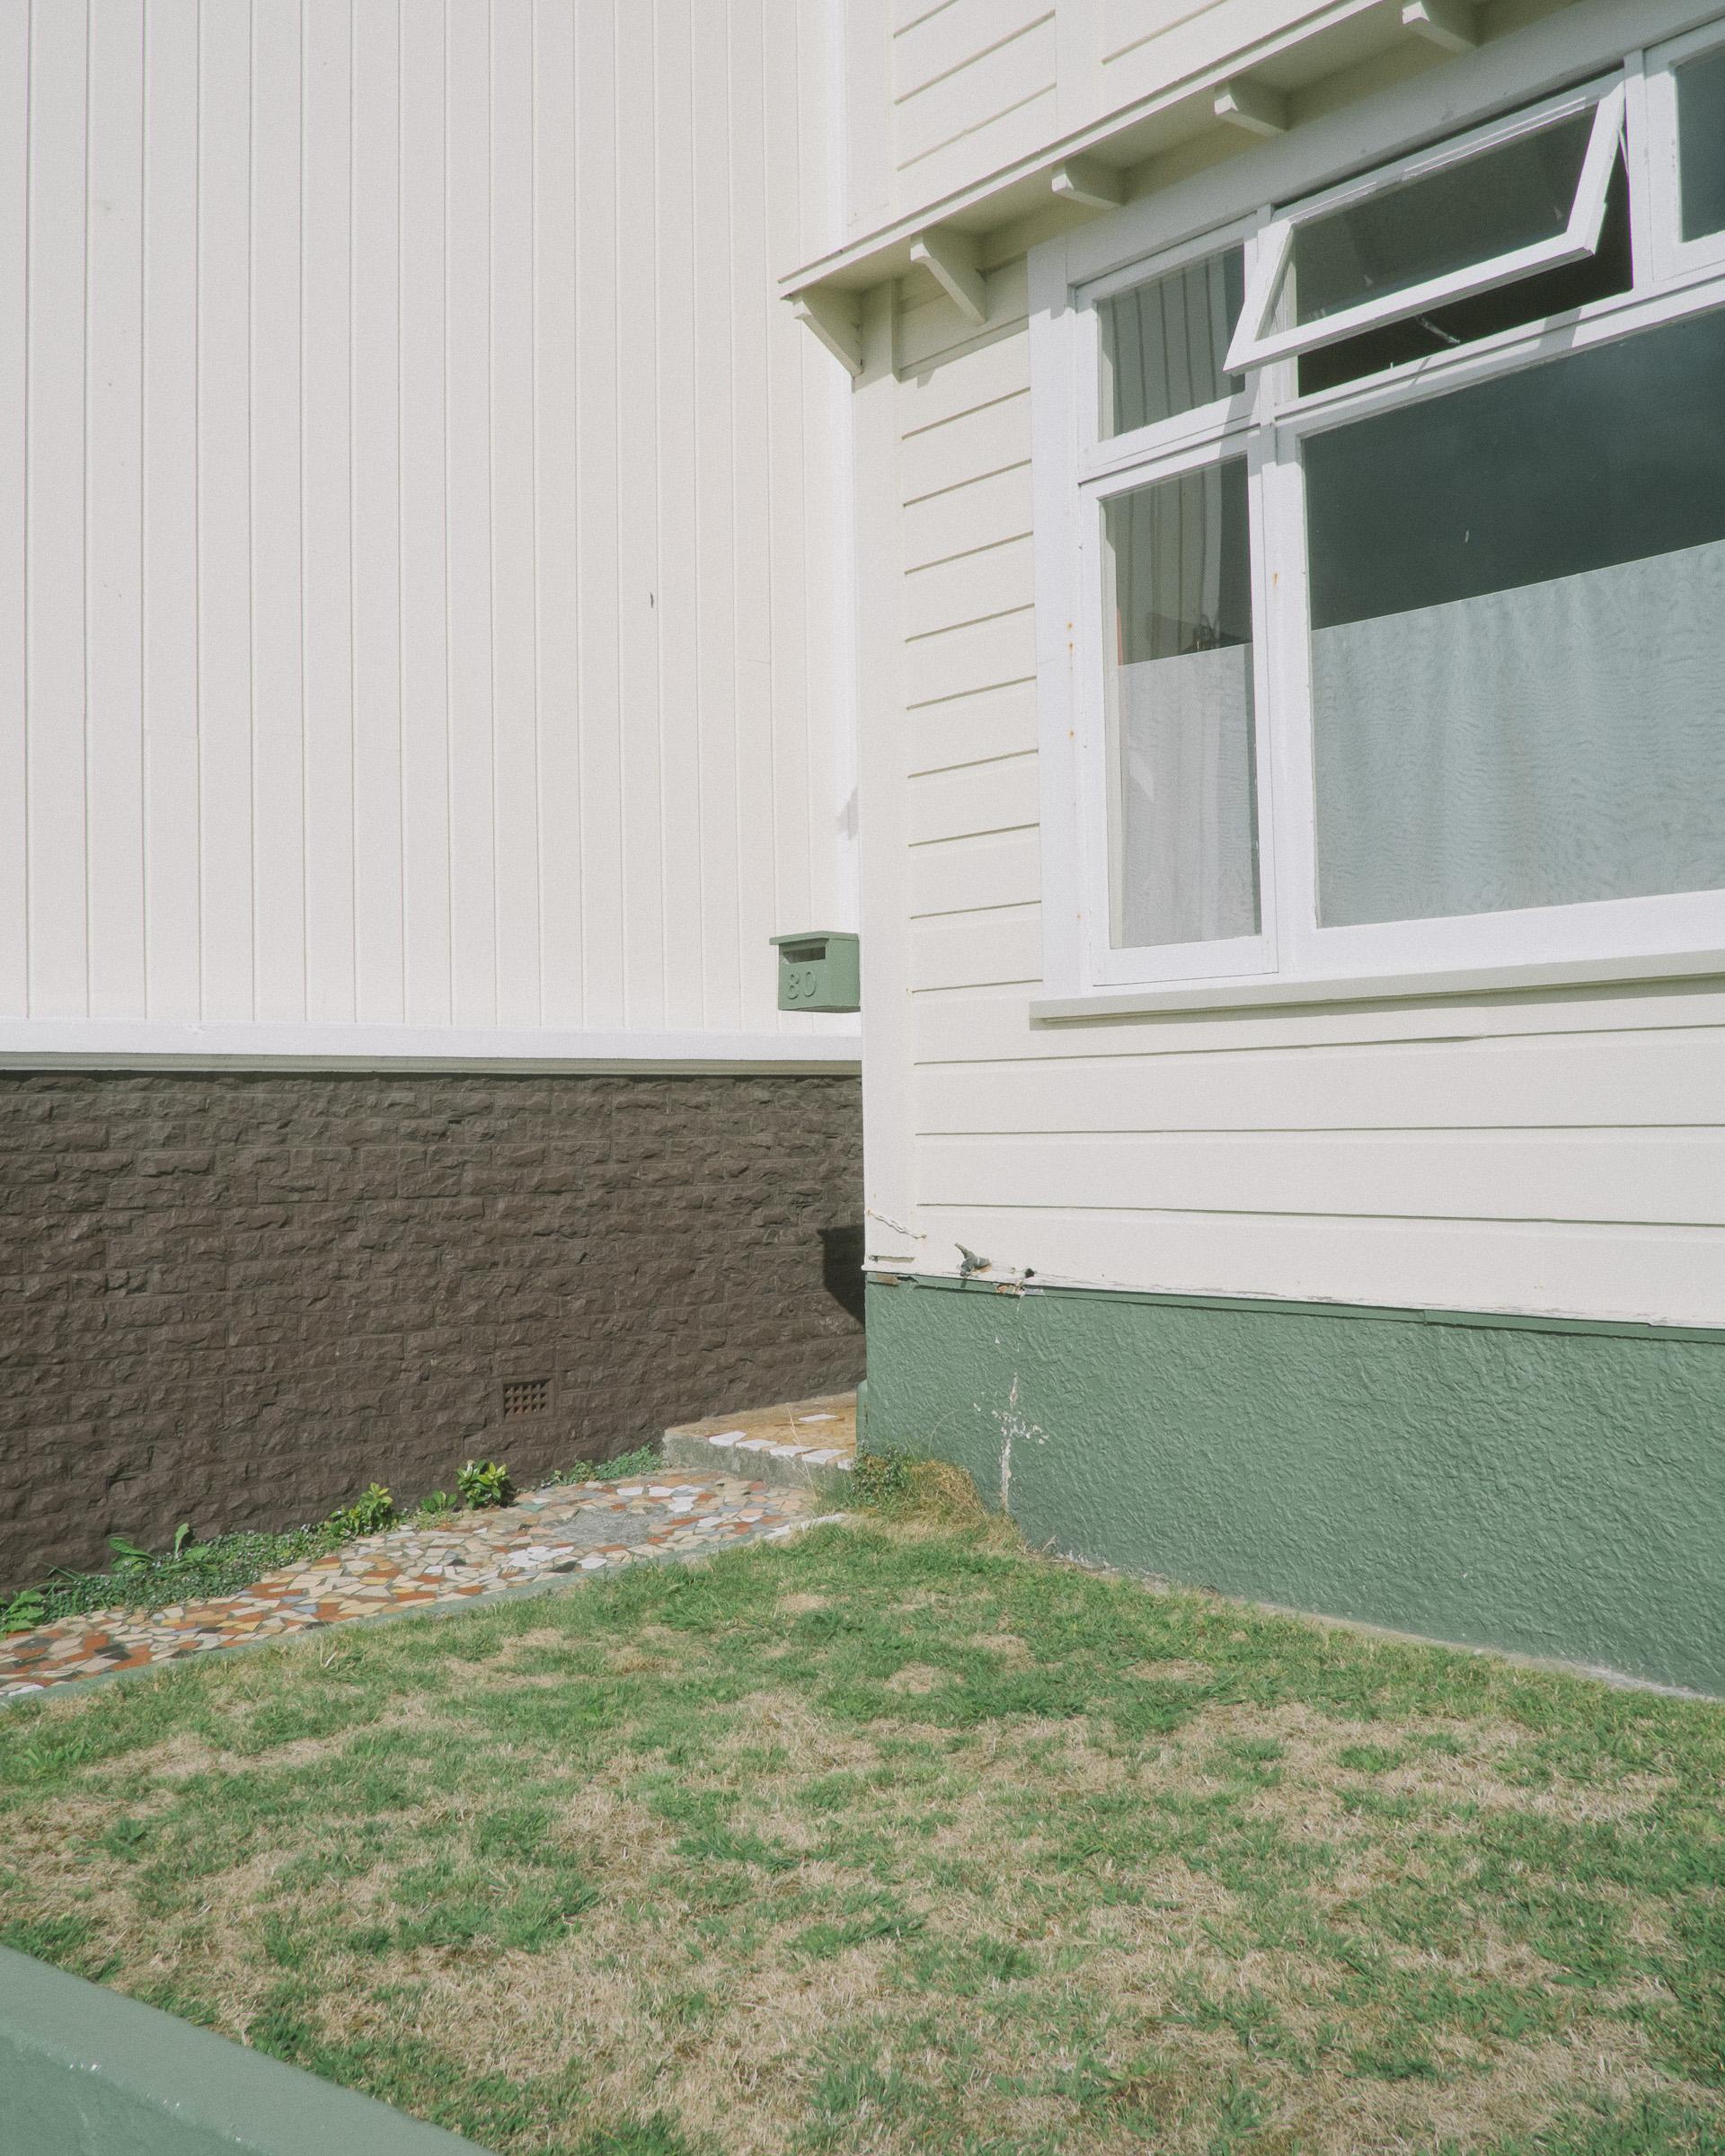 ids_suburbia-01-5.jpg